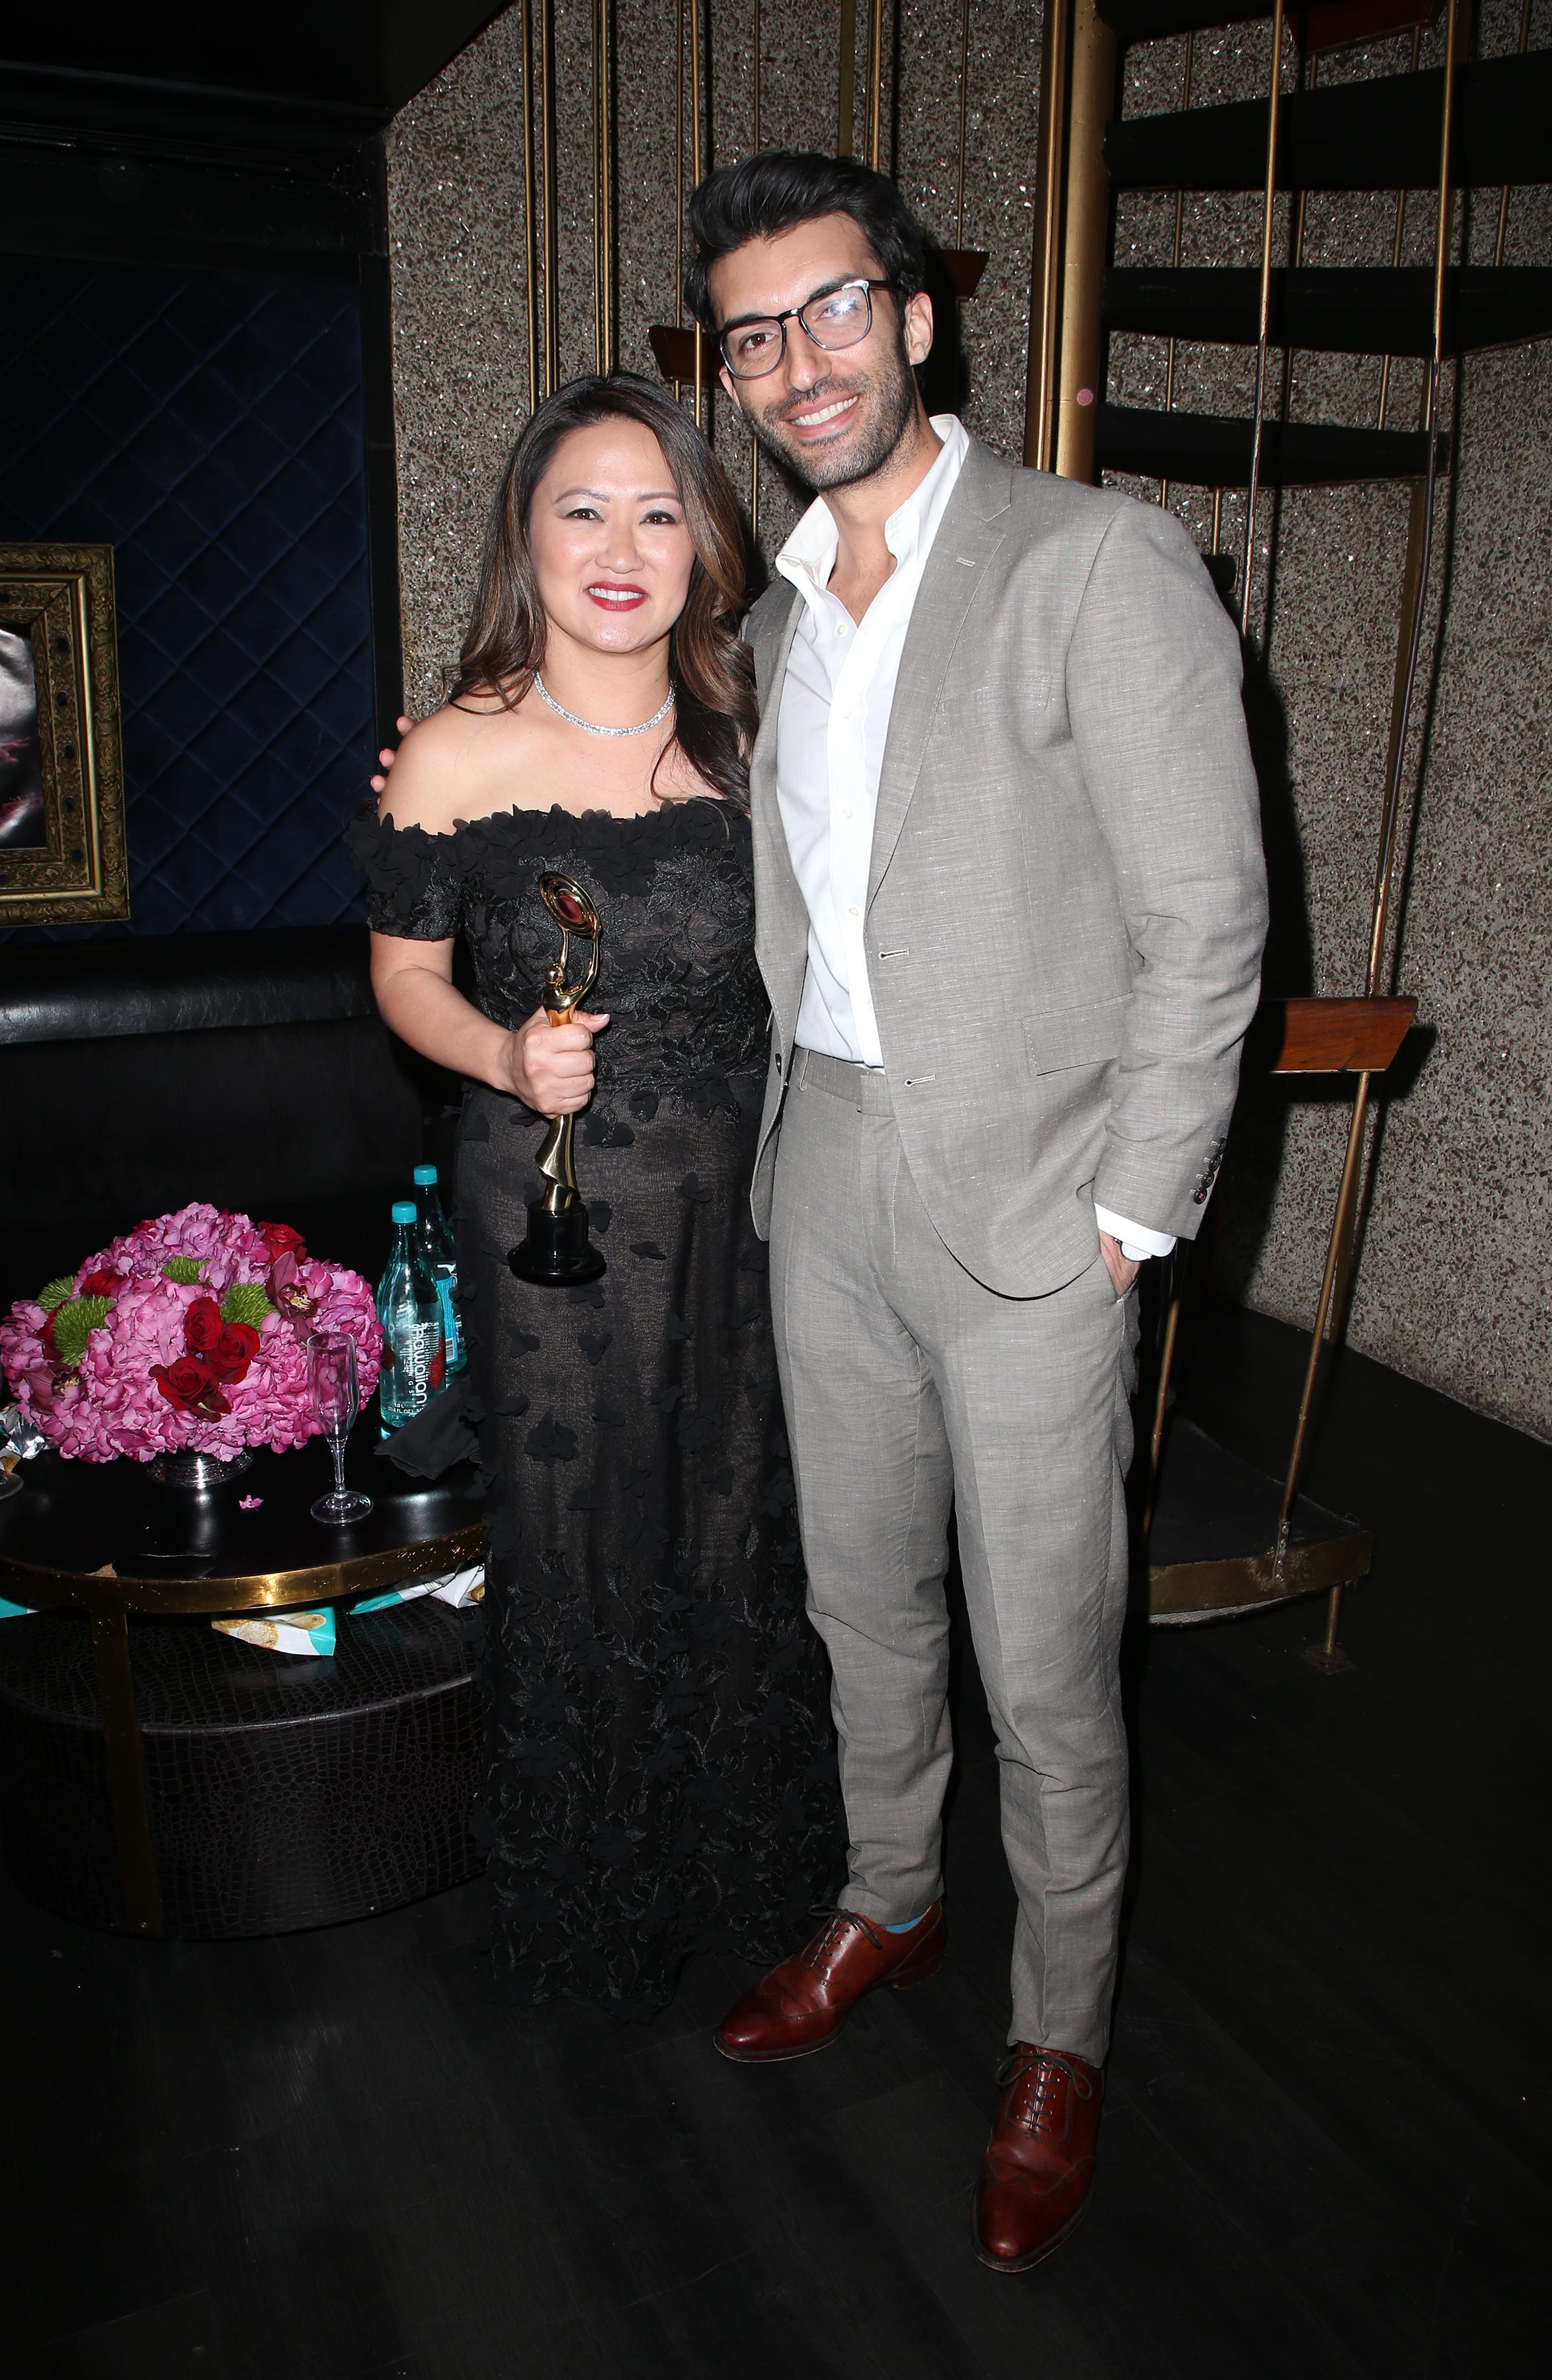 Desiree Nutley and Justin Baldoni | Feb 25, 2018, Hollywood Beauty Awards held at the Avalon